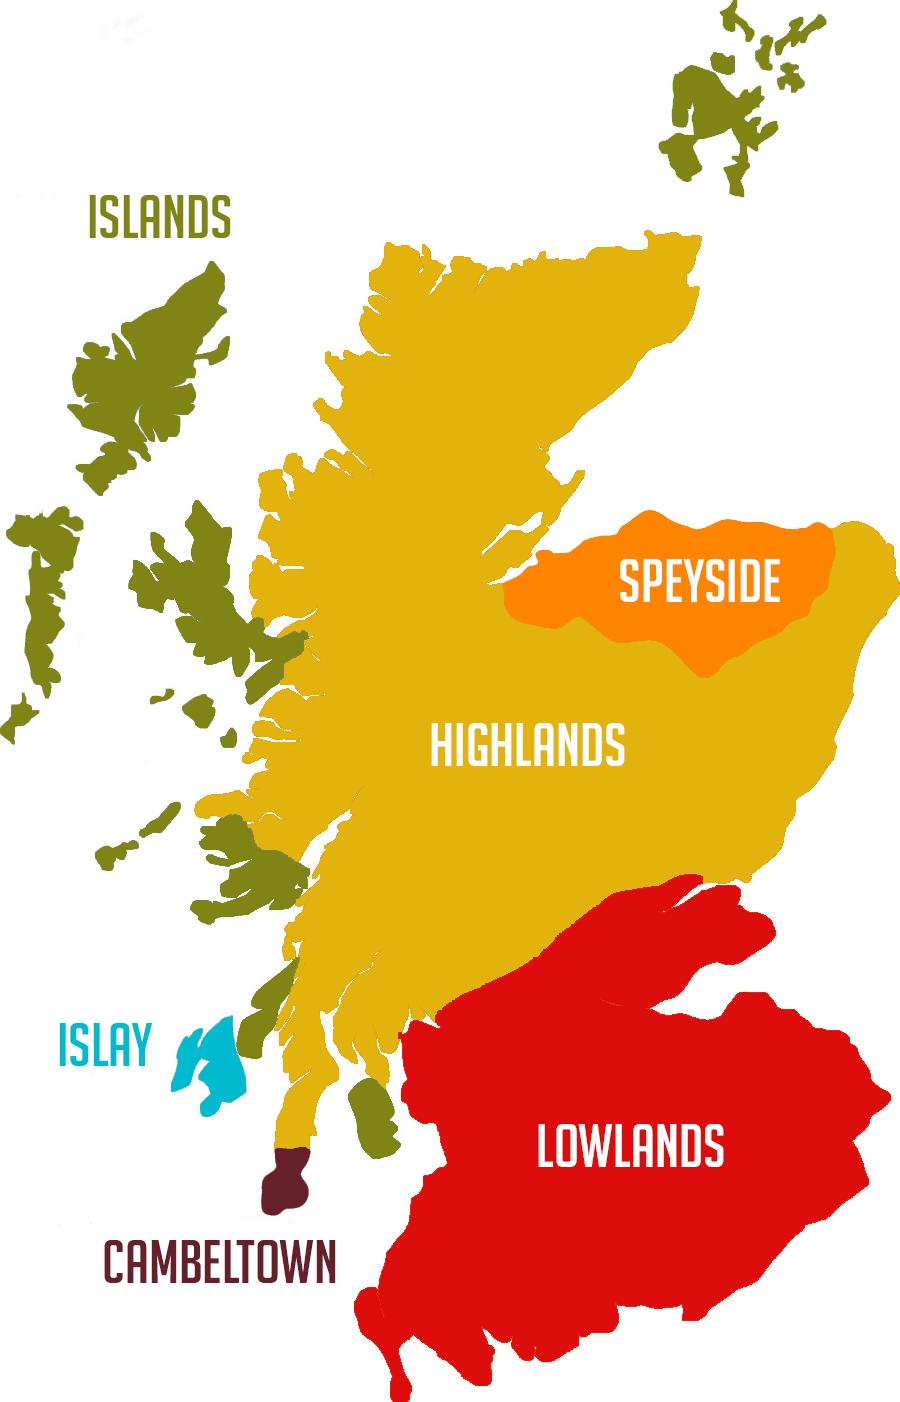 Scoland whisky-region-maps (from www.highestspirits.com)